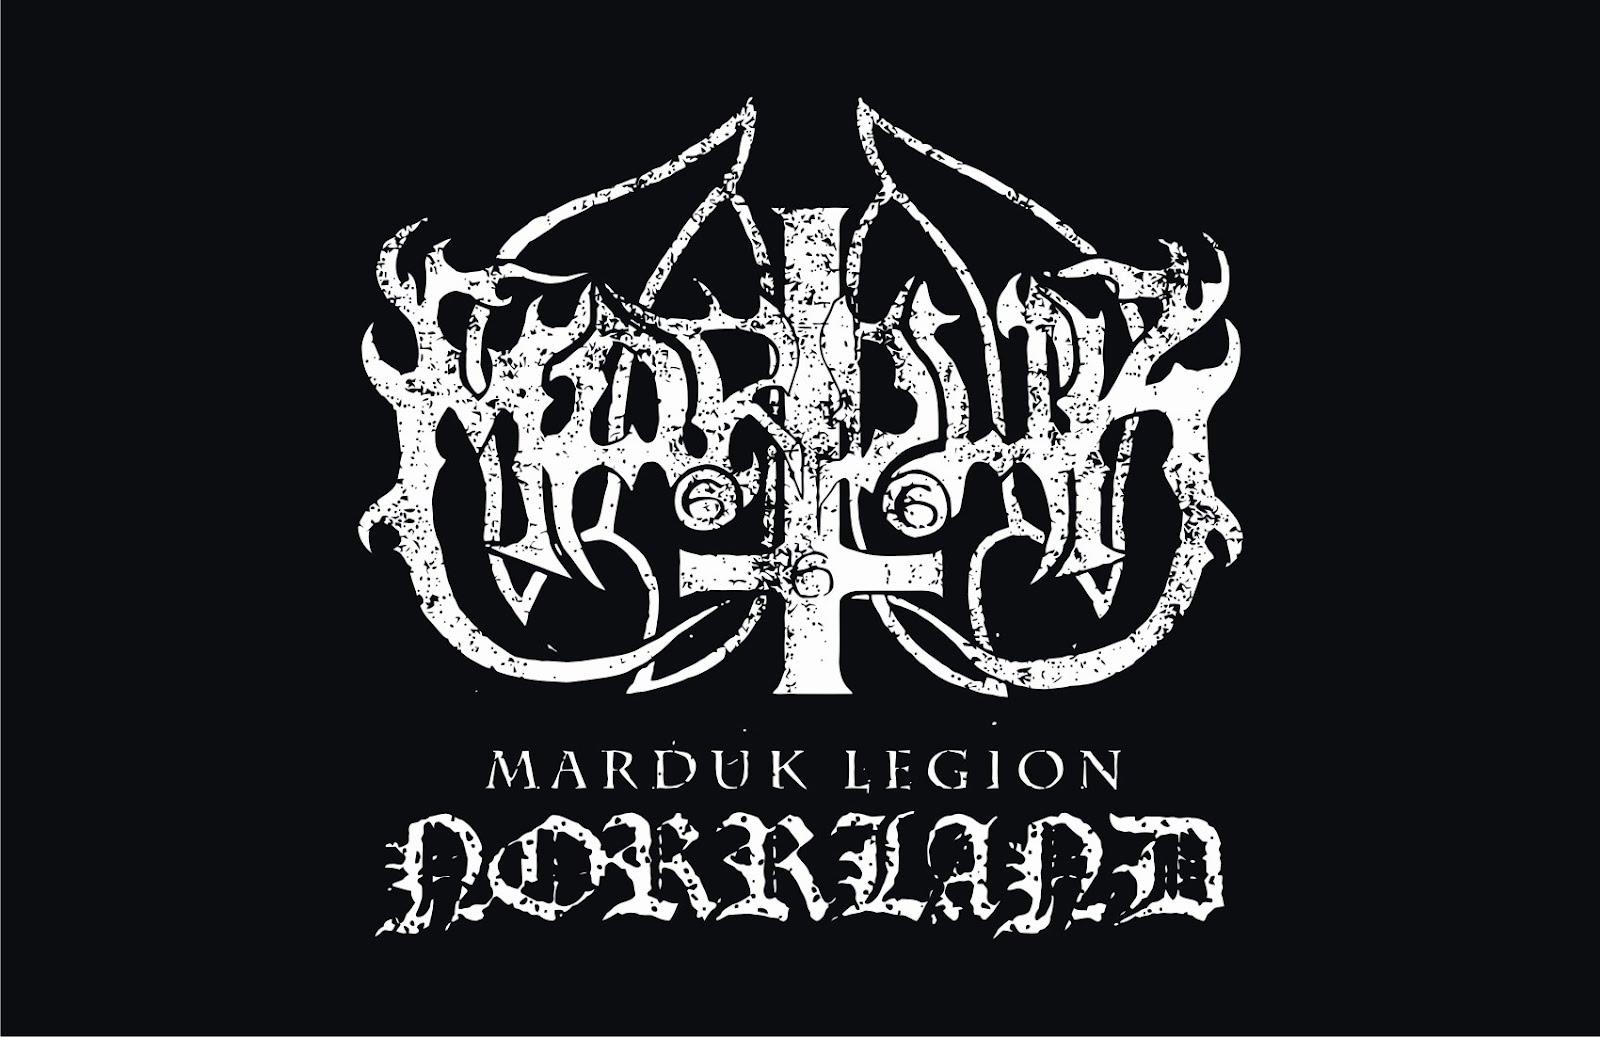 marduk-marduk_legion_norrland_front_vector